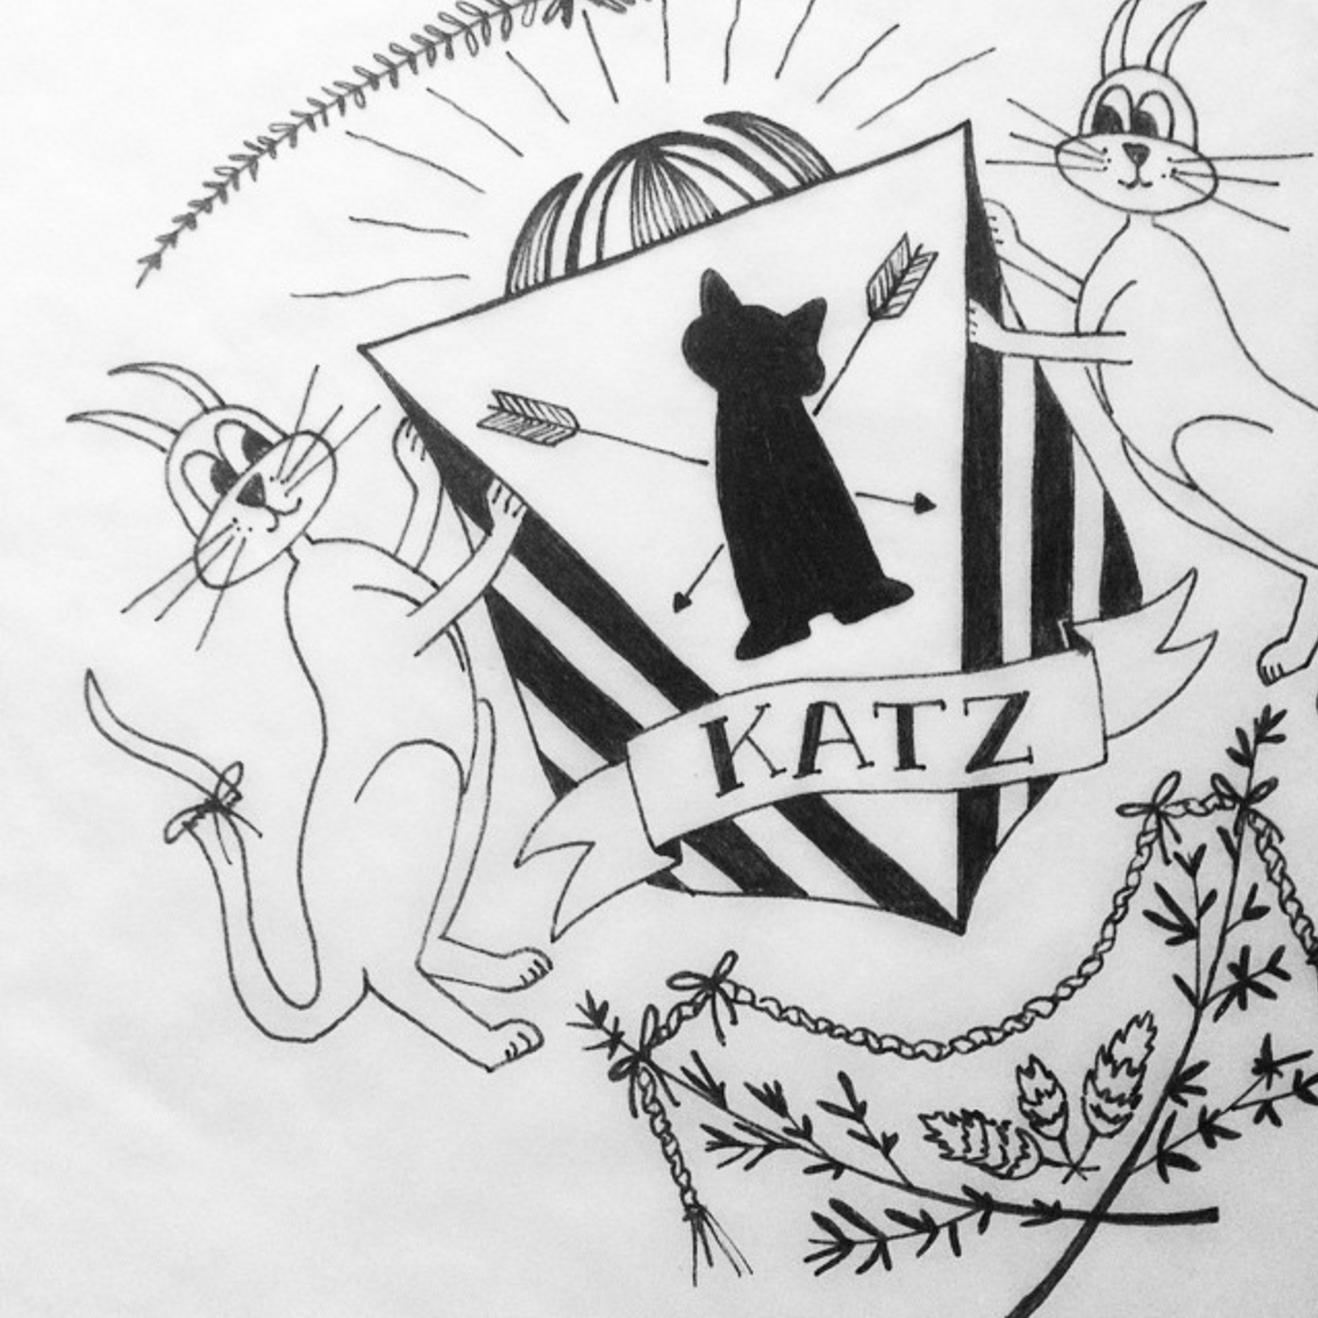 Katz family crest I designed for my parents' anniversary.